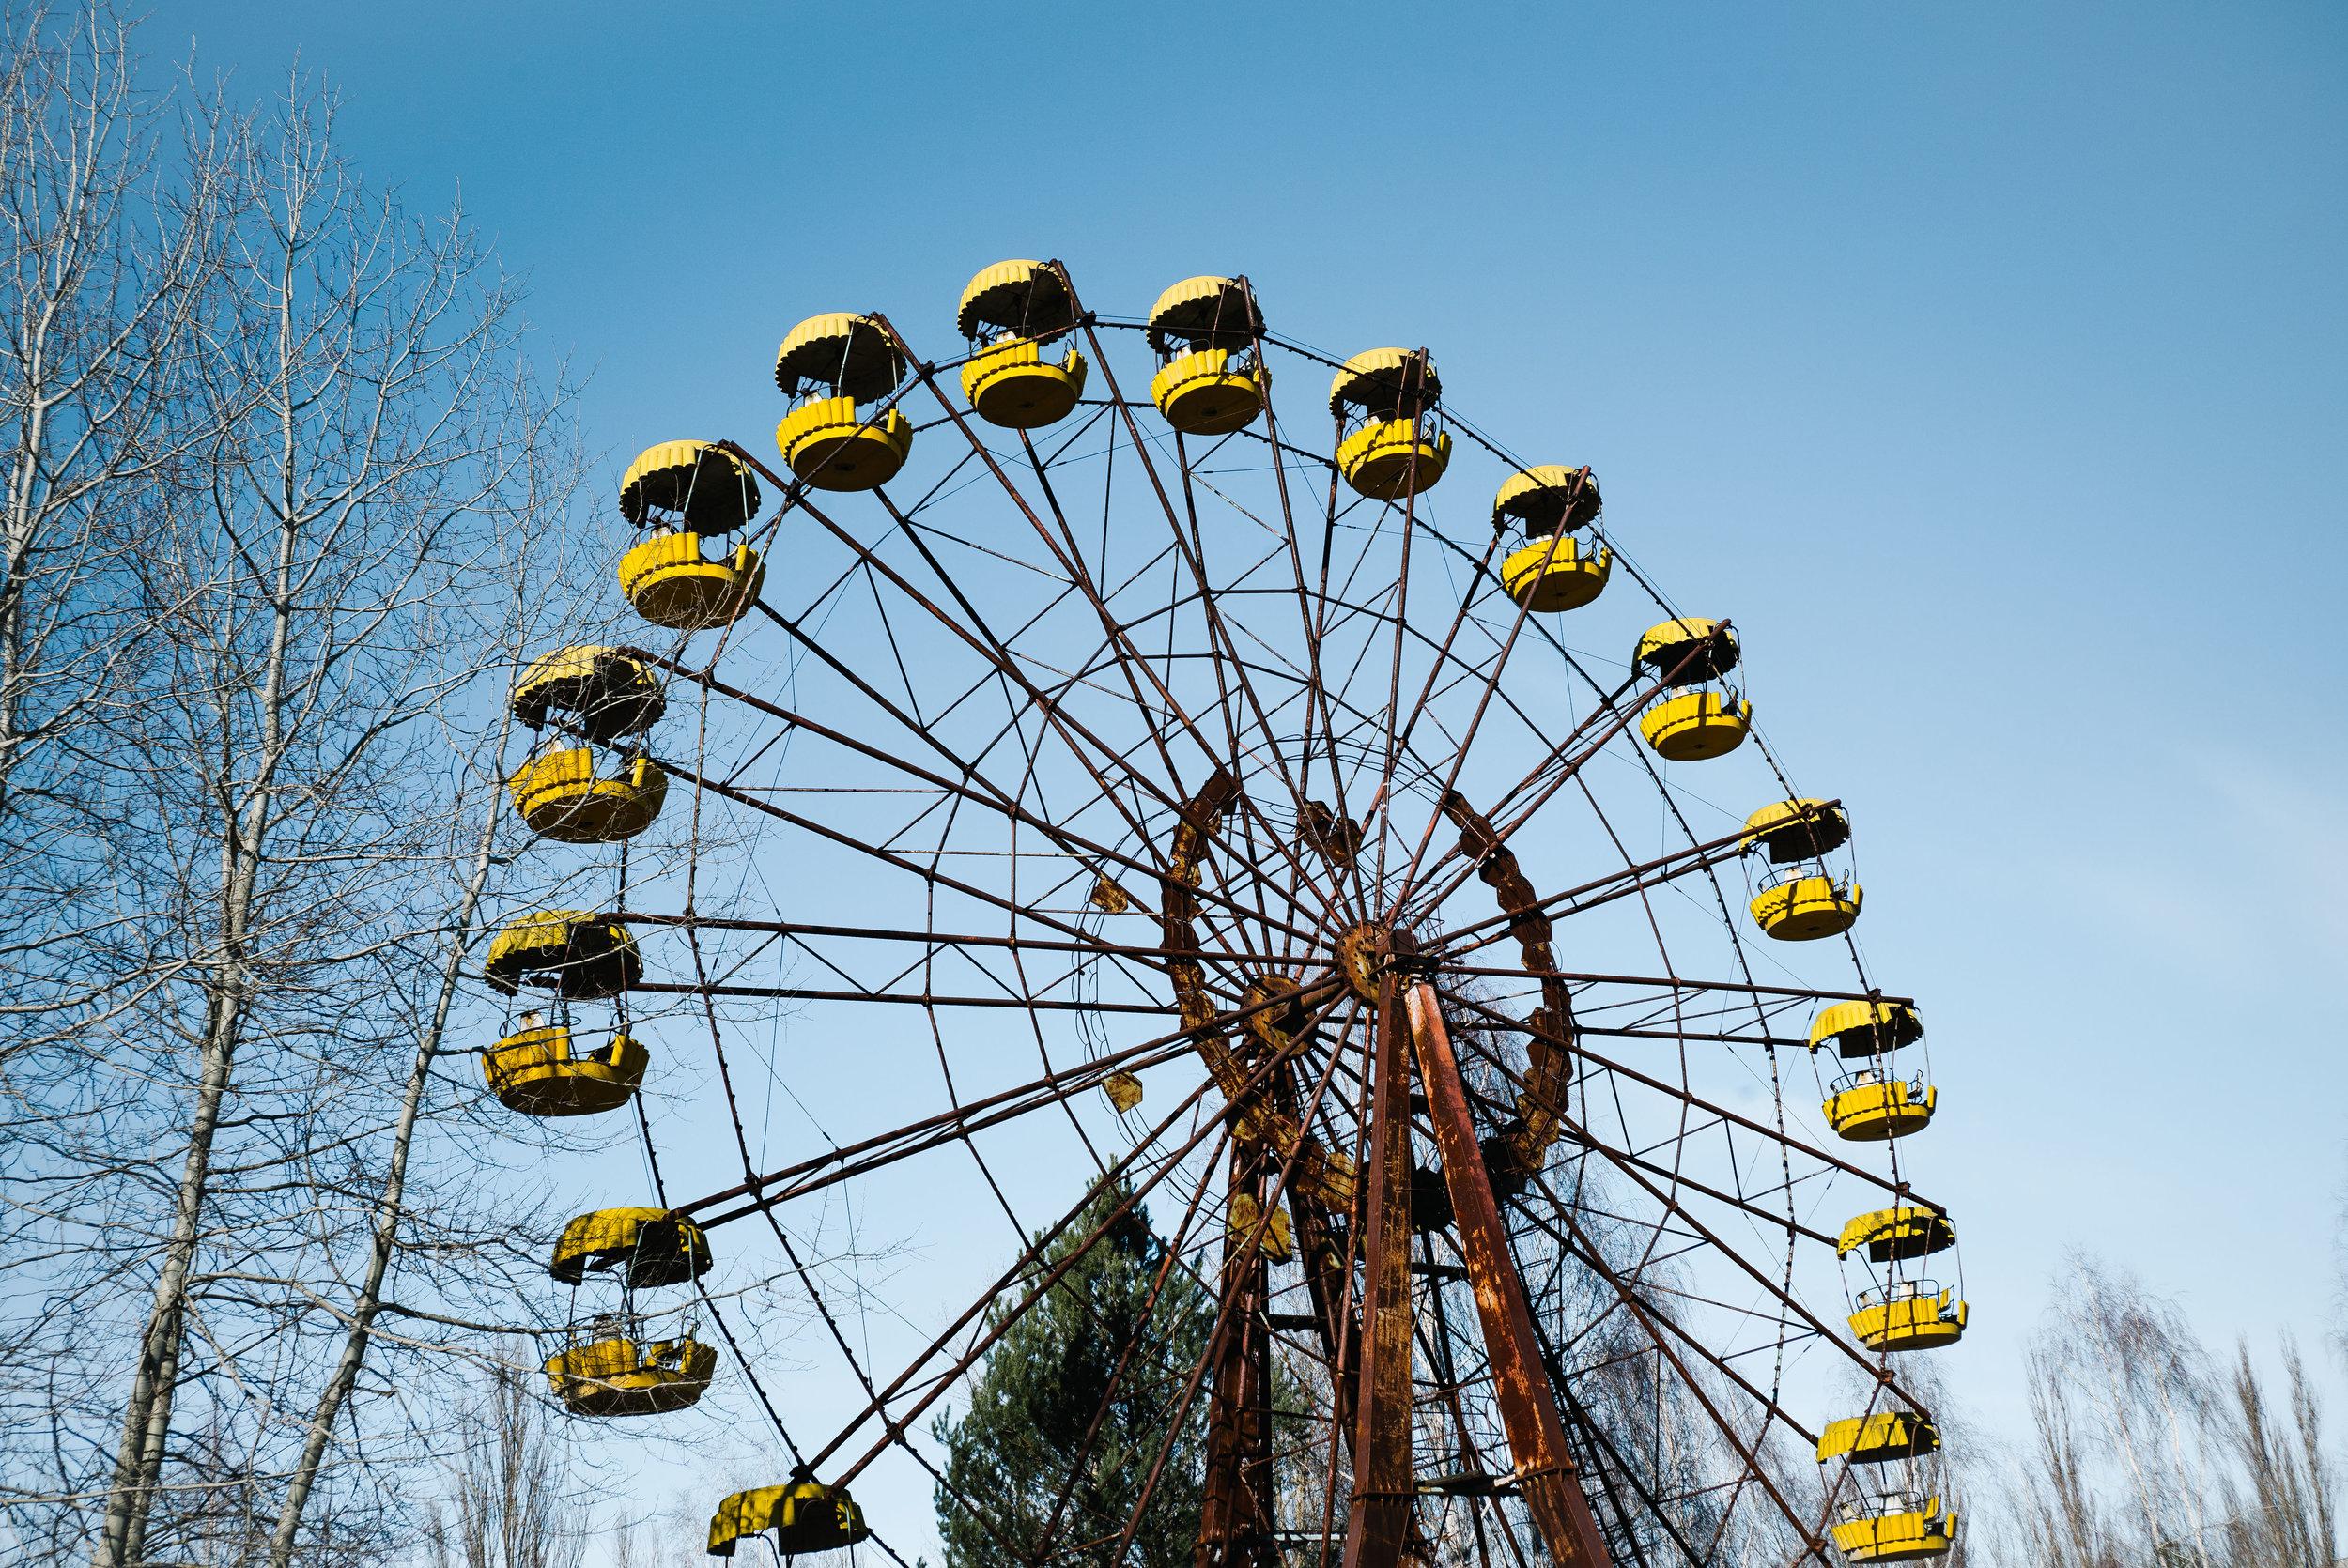 Pripyat Ferris Wheel - Clifford Darby 2019